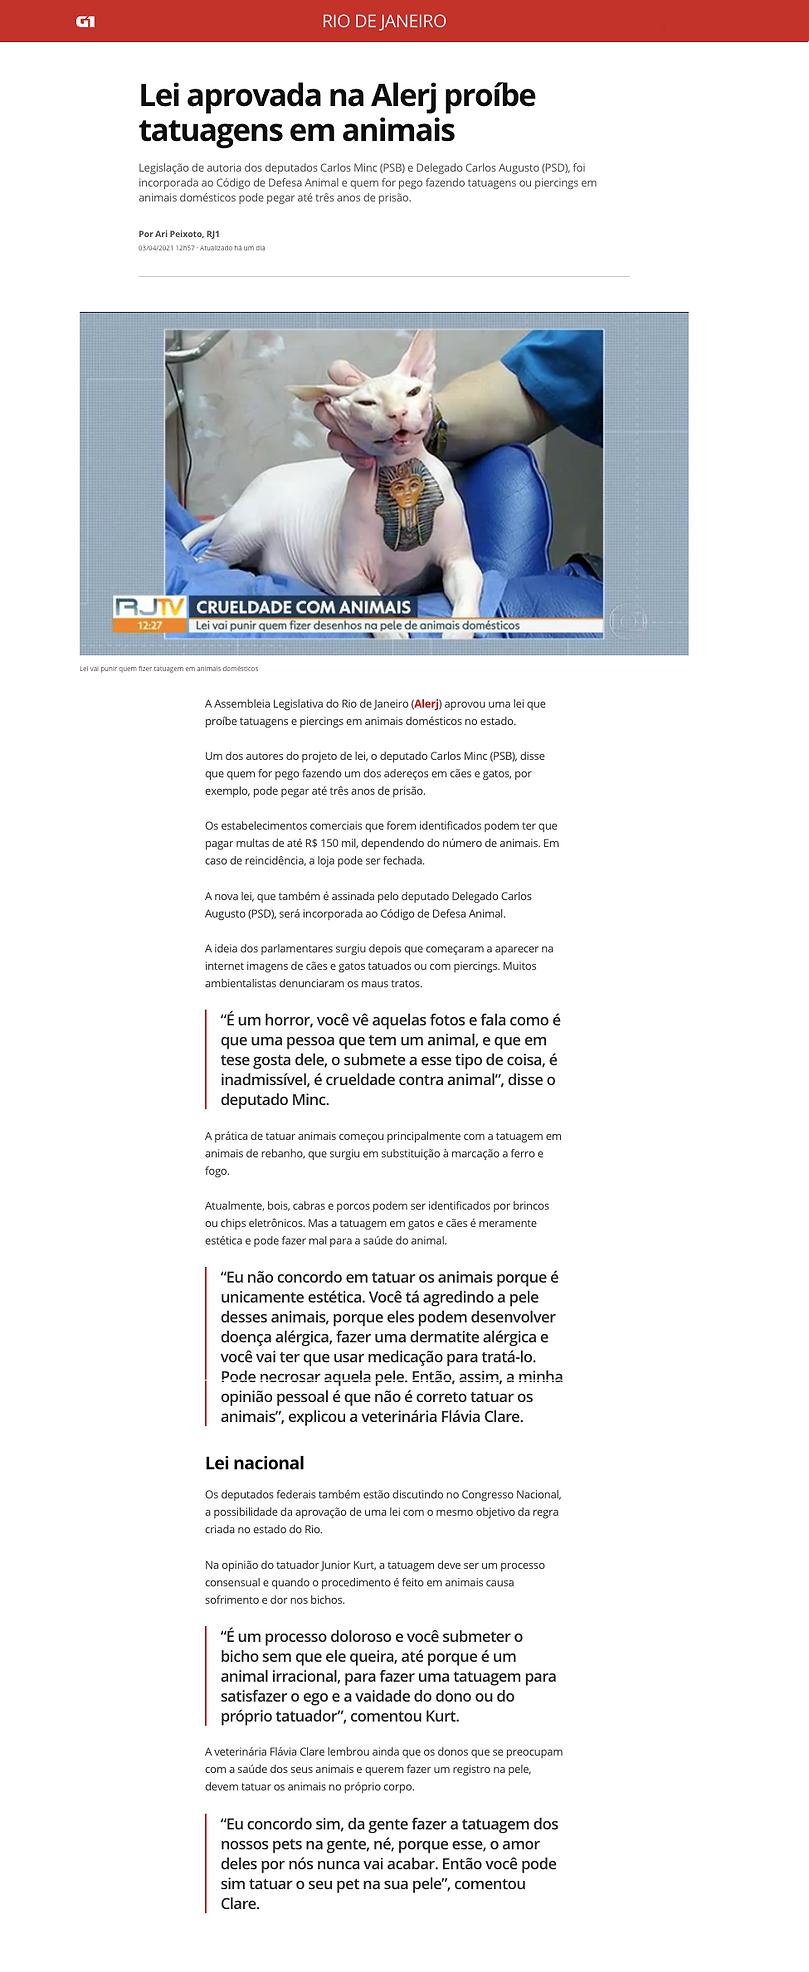 screenshot-g1.globo.com-2021.04.05-11_57